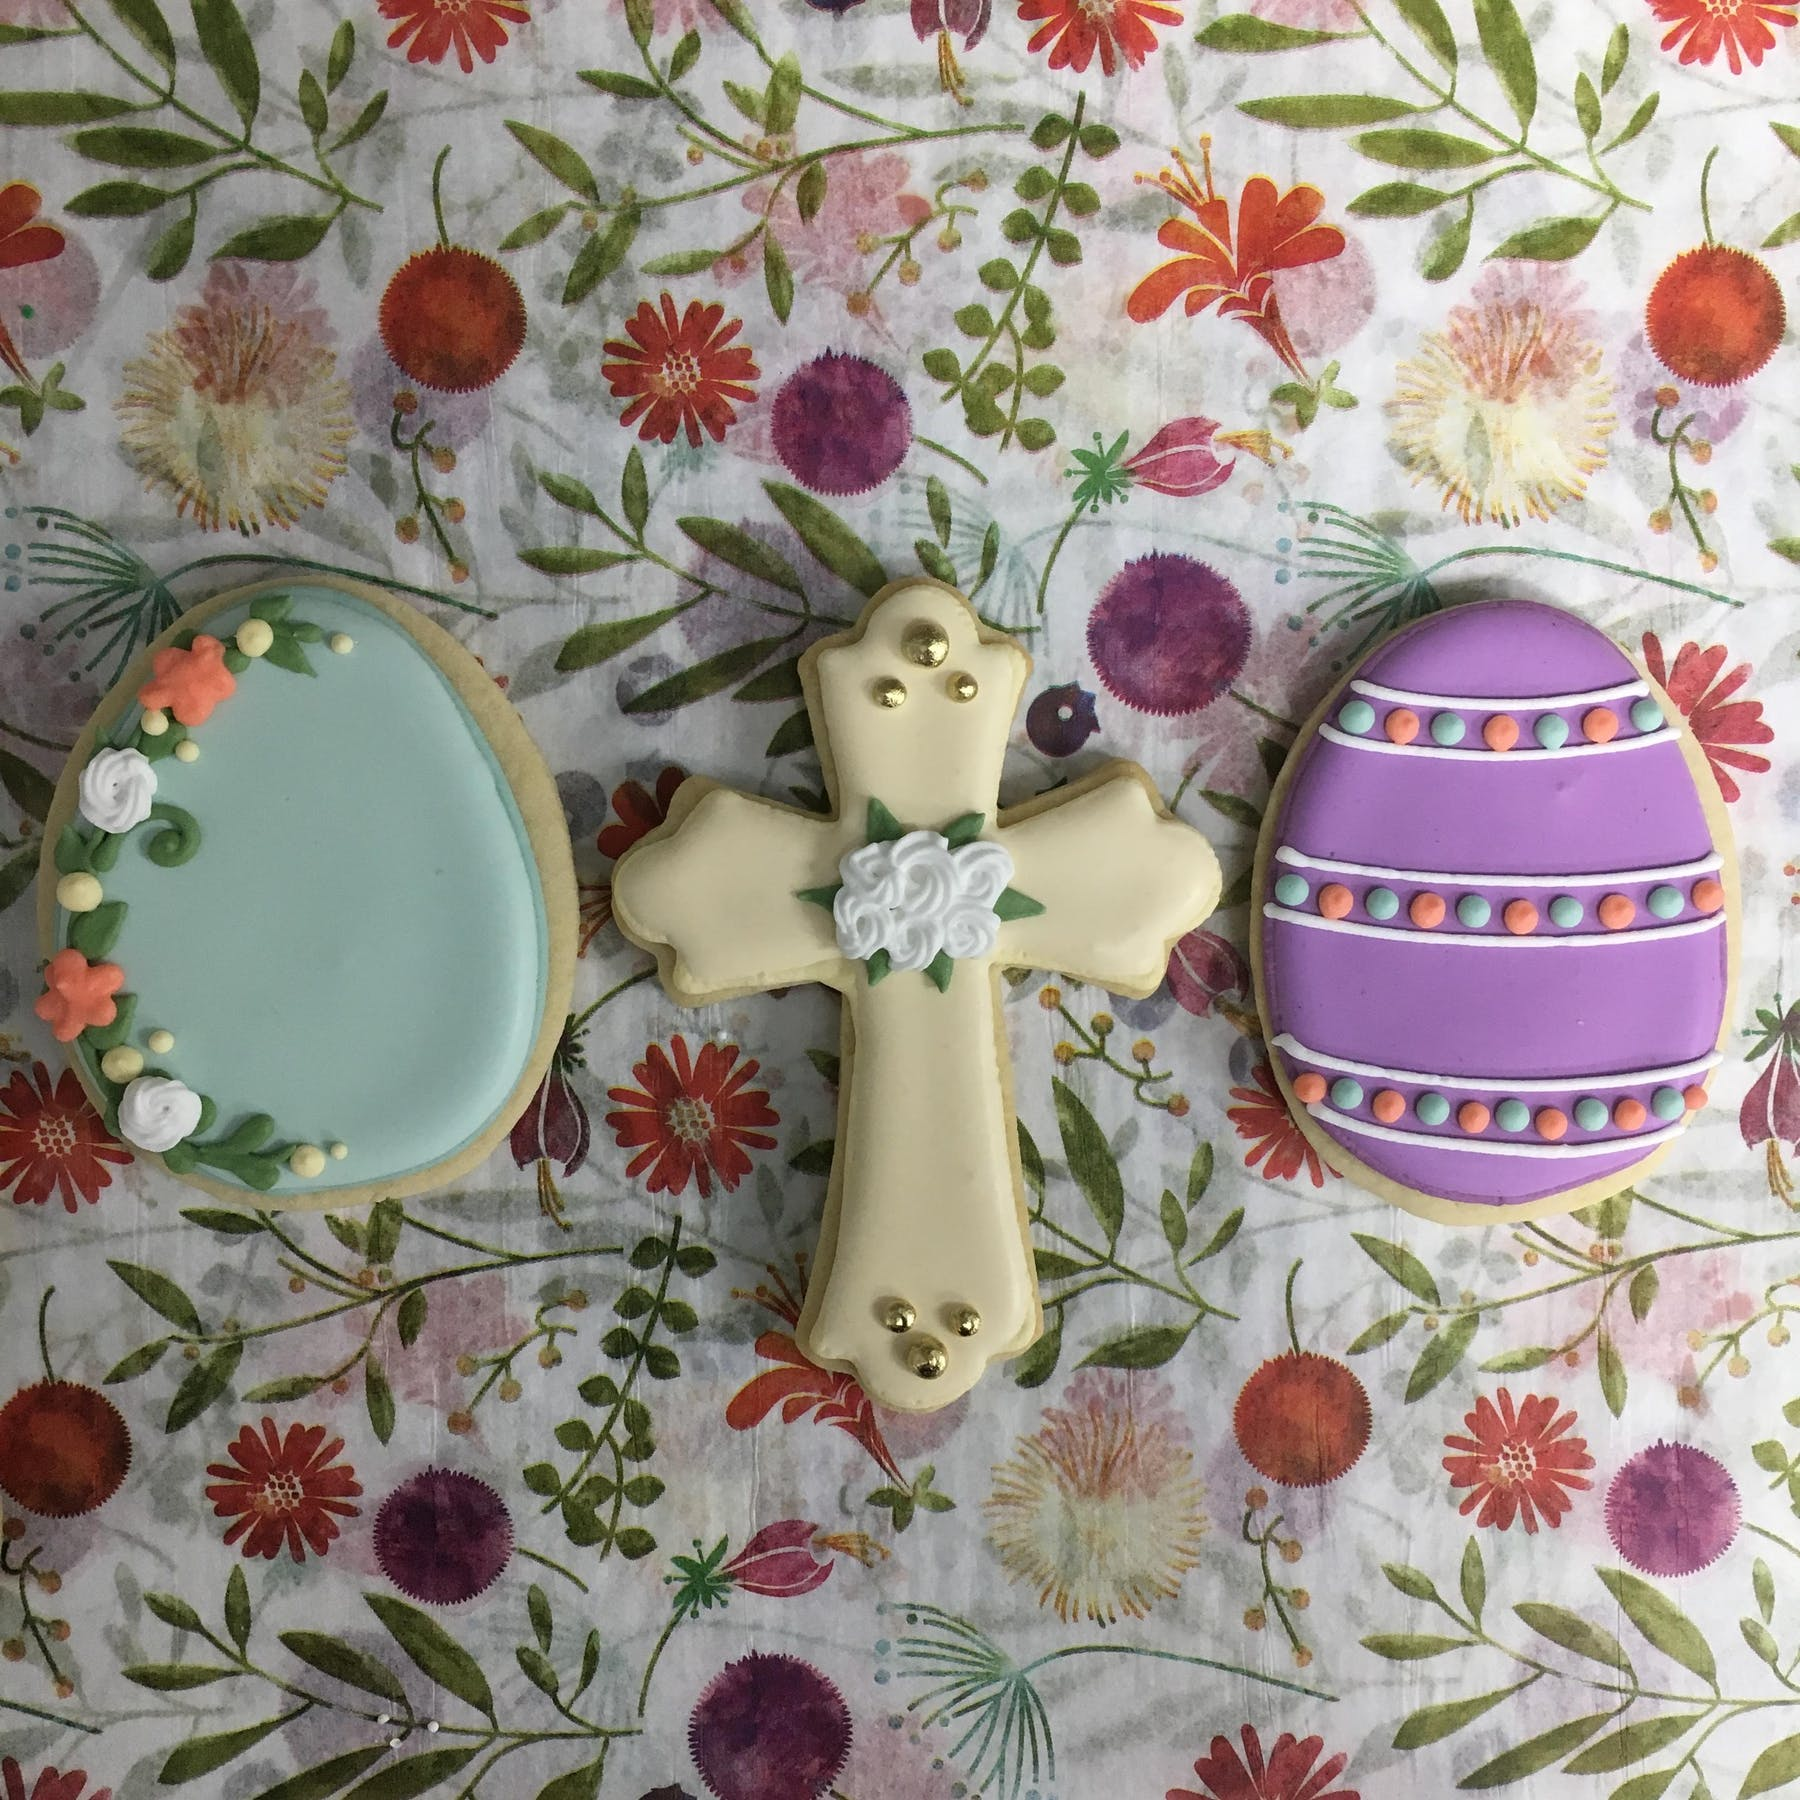 catholic themed cookies